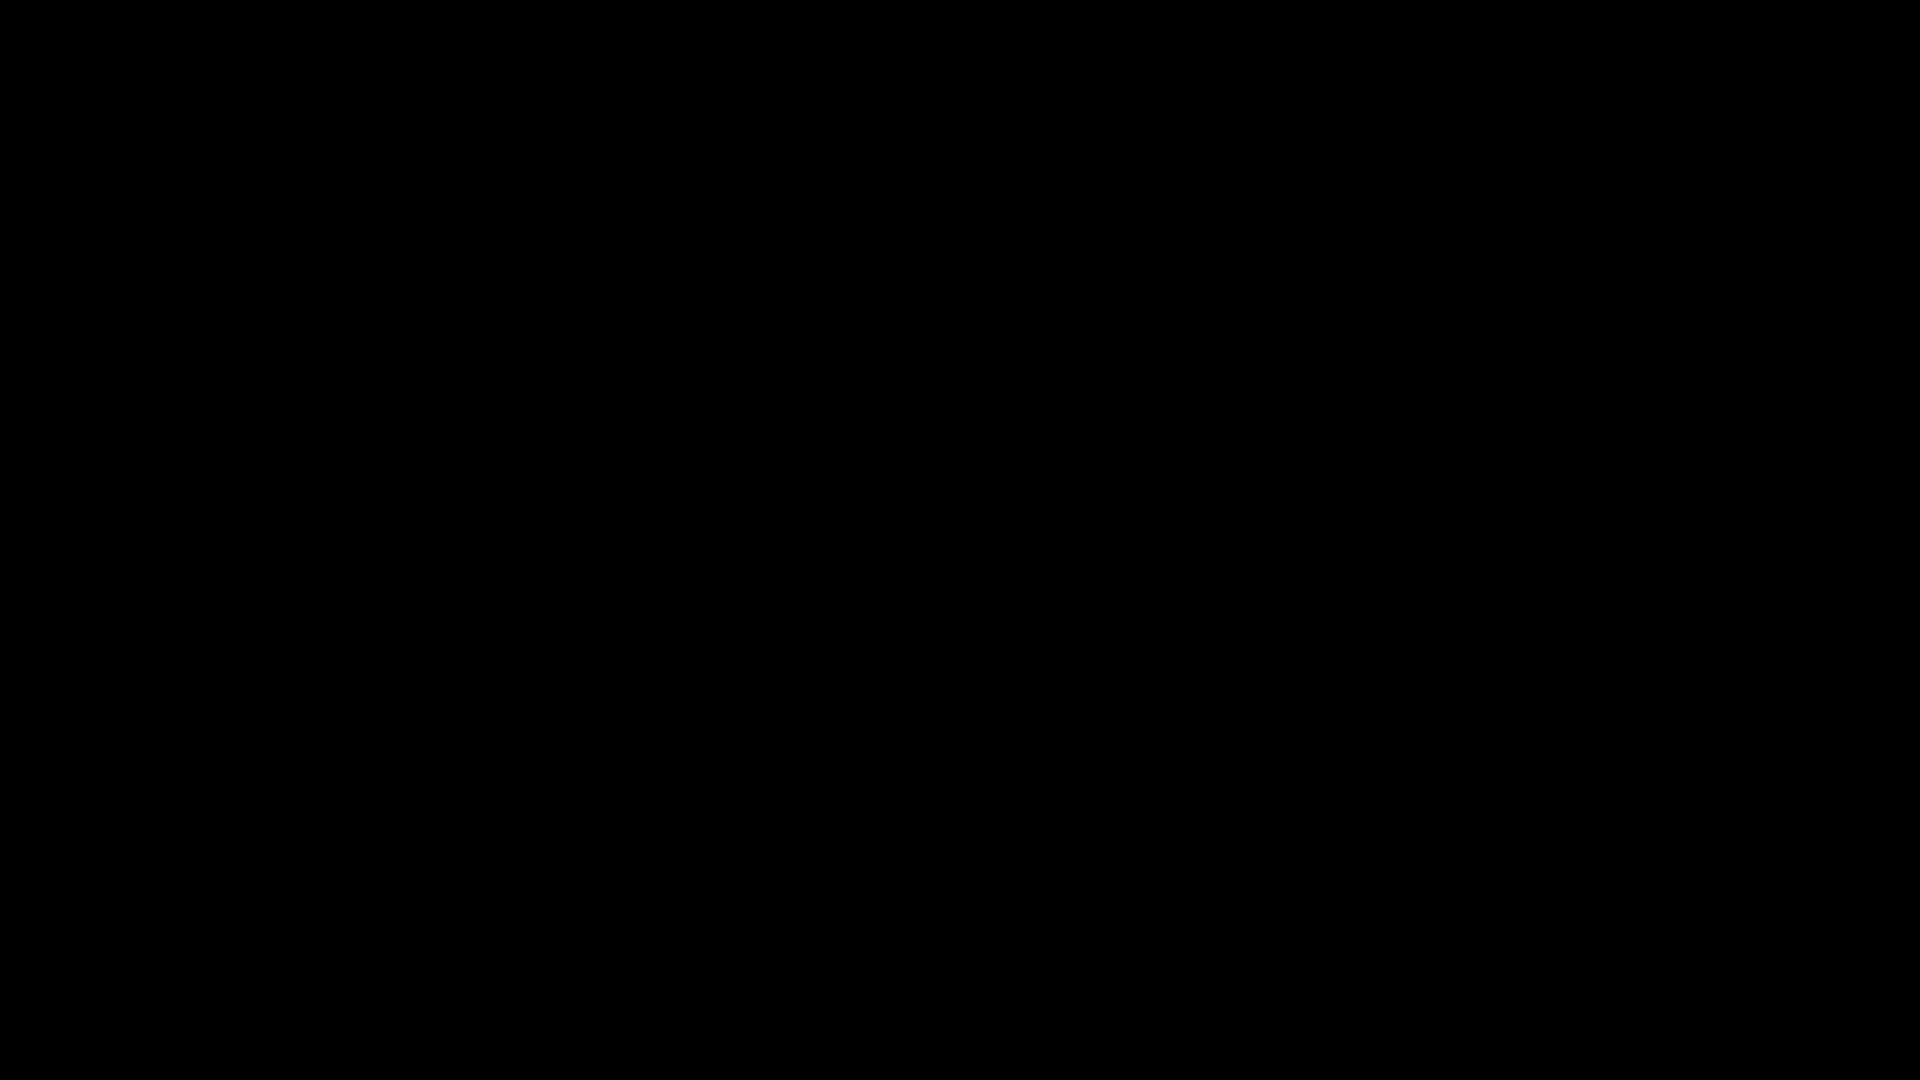 BKT, Baran Kadir Tekin, Egg Wars, Games Time BKT, Hunger Games, Master Builders, Minecraft, Minecraft nasıl yüklenir, Oyunları, Speed Builders, burak oyunda, counter strike, enes batur, garbarius, genç hane, minecraft evi, minecraft server, orkun ışıtmak, oyun portal, sarp atilla, Okul Vlog GIFs